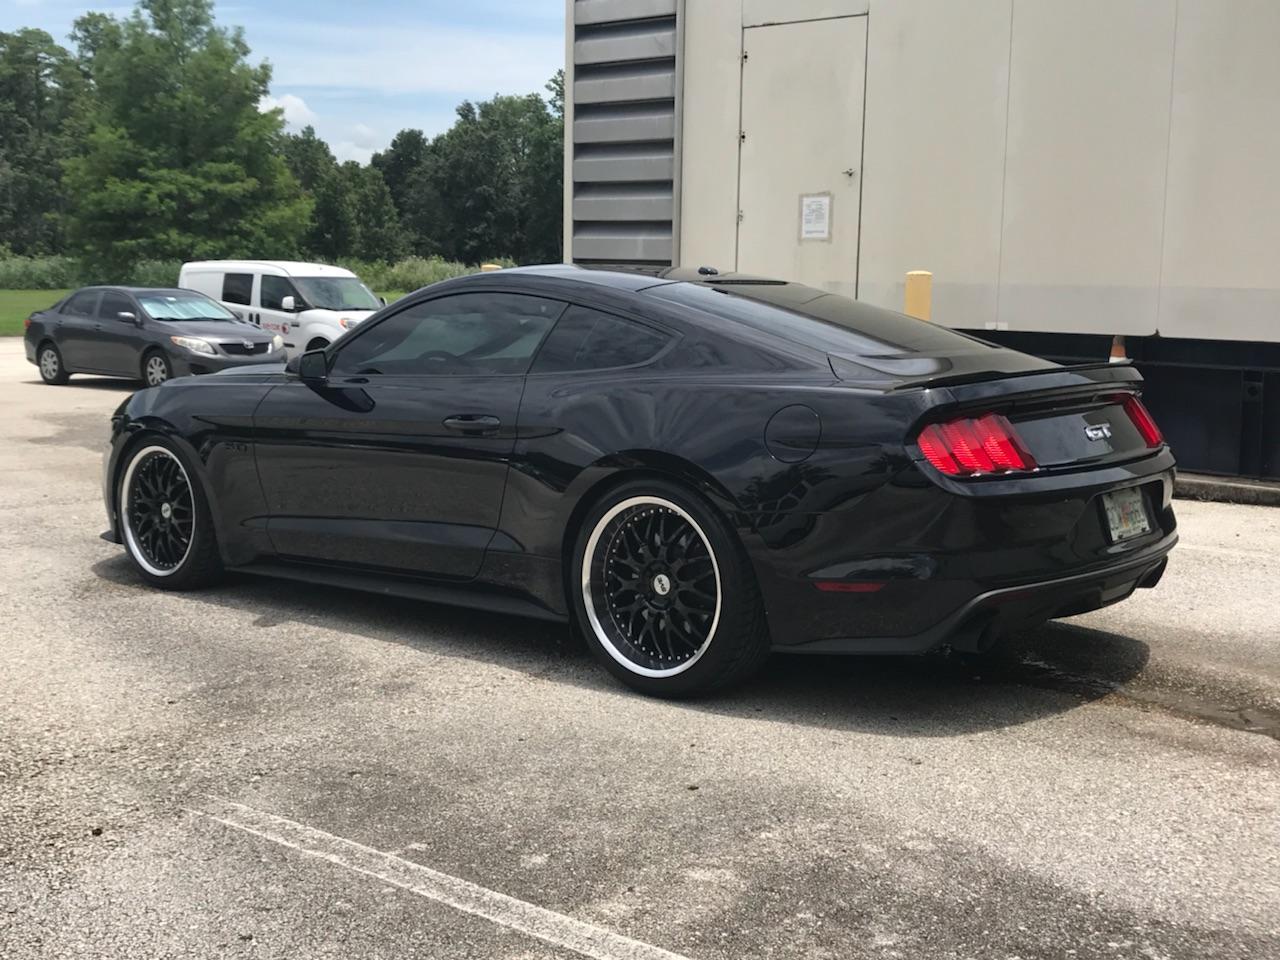 SVE Mustang Series 3 Wheel & Tire Kit - 20x8 5/10 Gloss